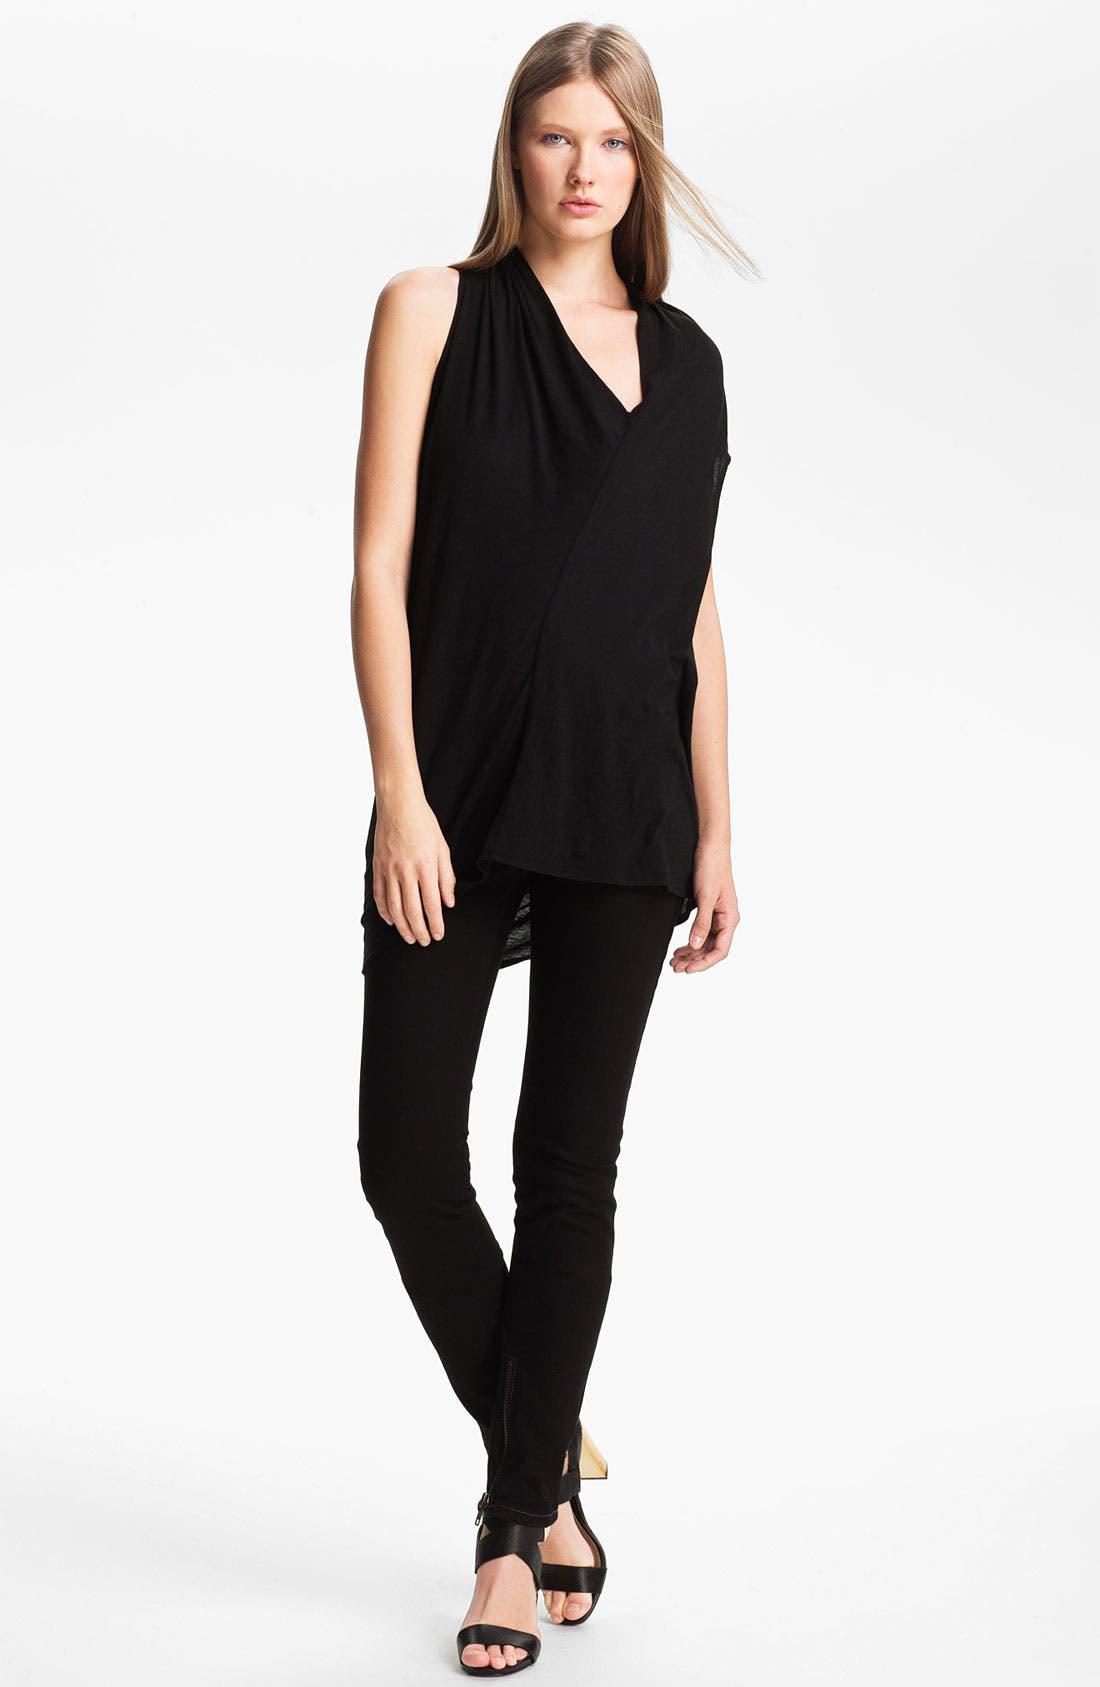 Alternate Image 1 Selected - Rachel Zoe 'Denise' Asymmetrical Cotton Top